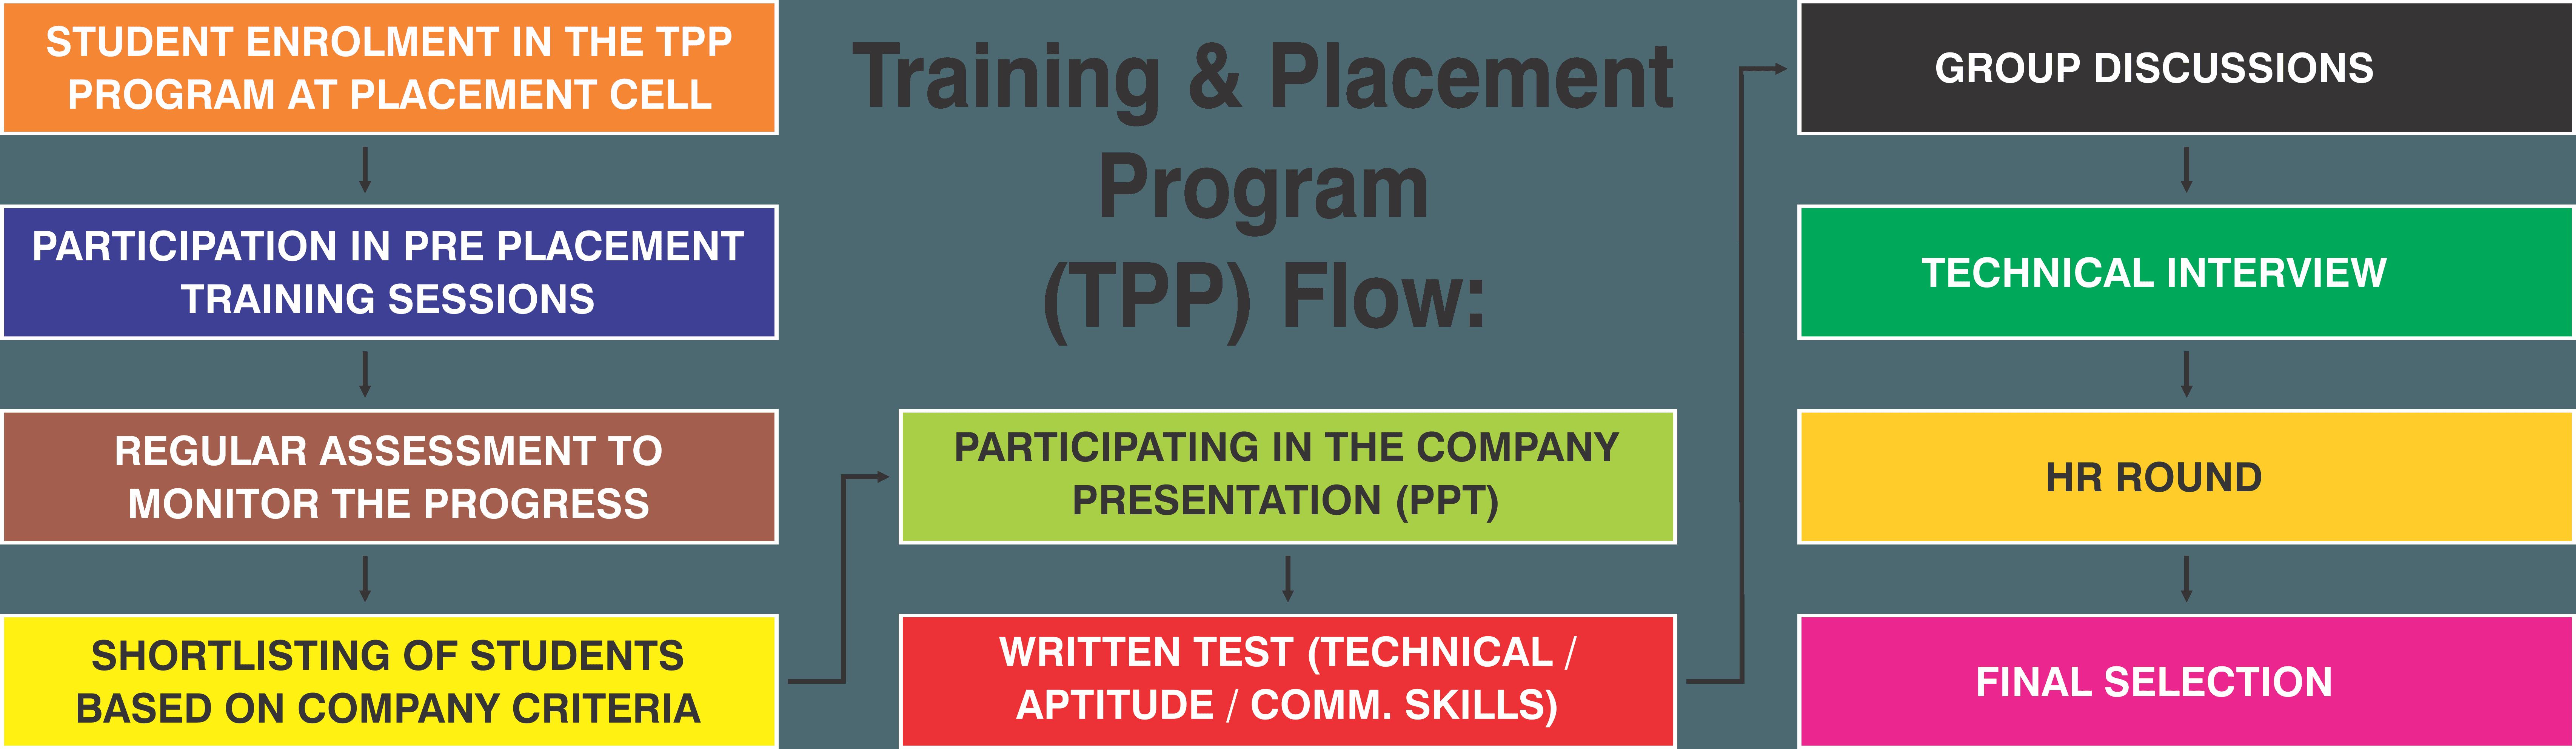 tpp-flow